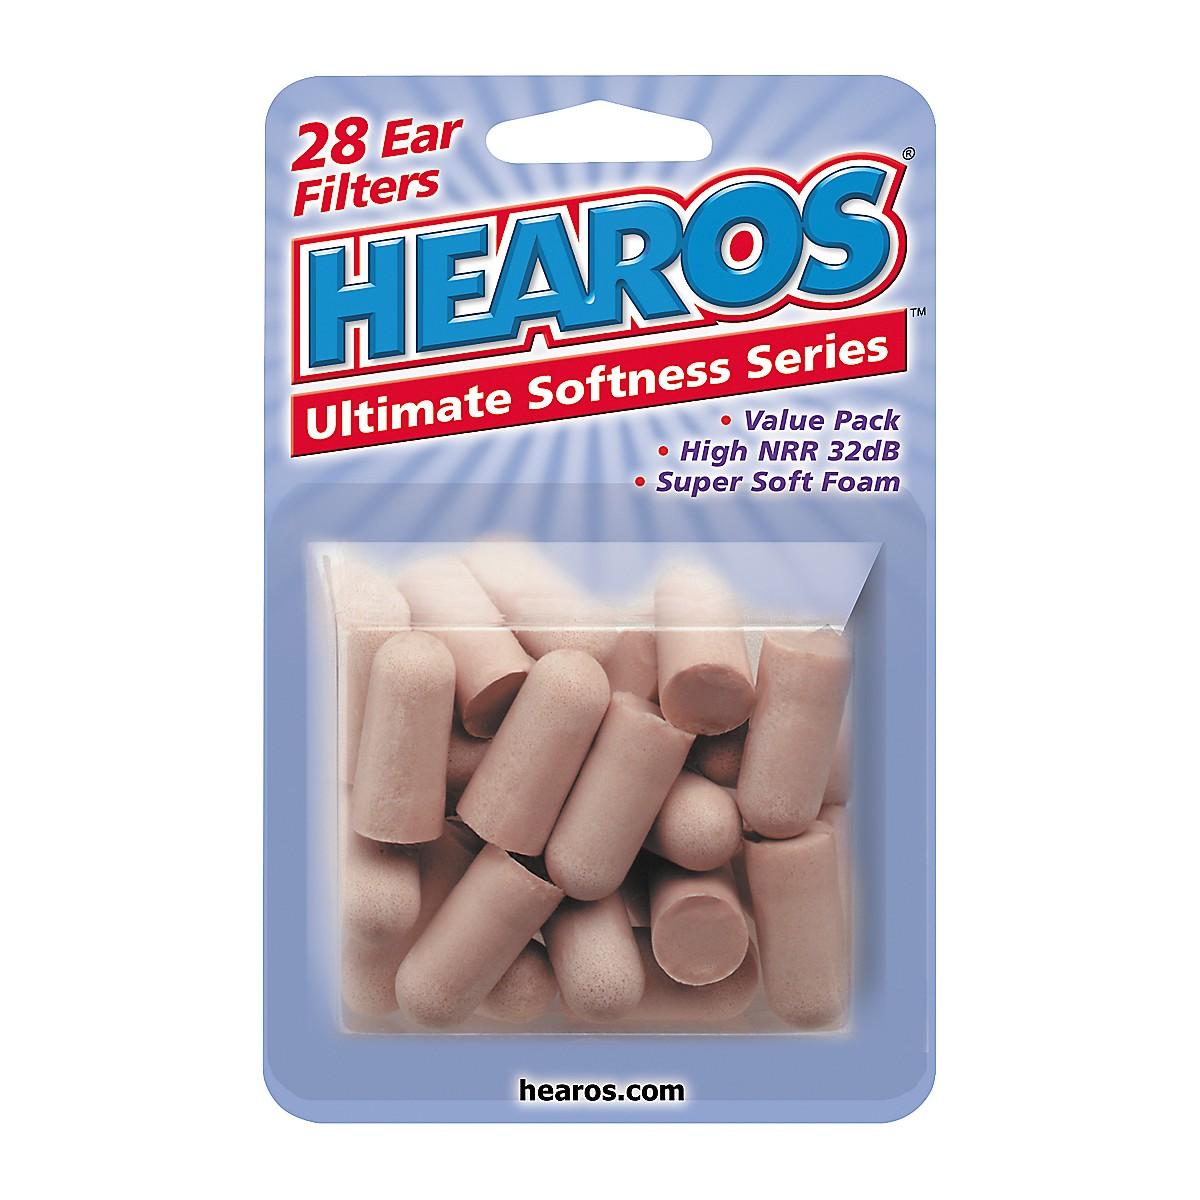 Hearos Value Pack Ear Plugs (28 Pack)